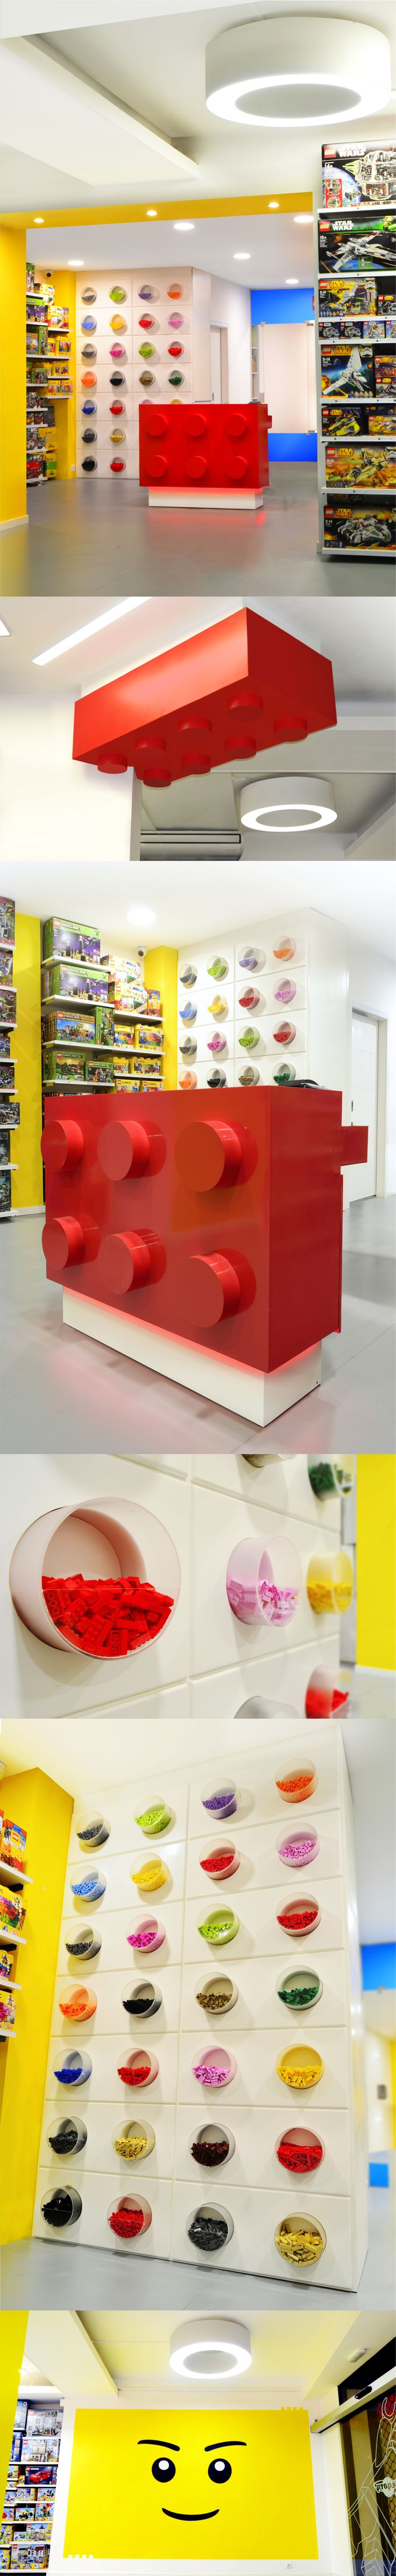 LEGO store in Barcelona.